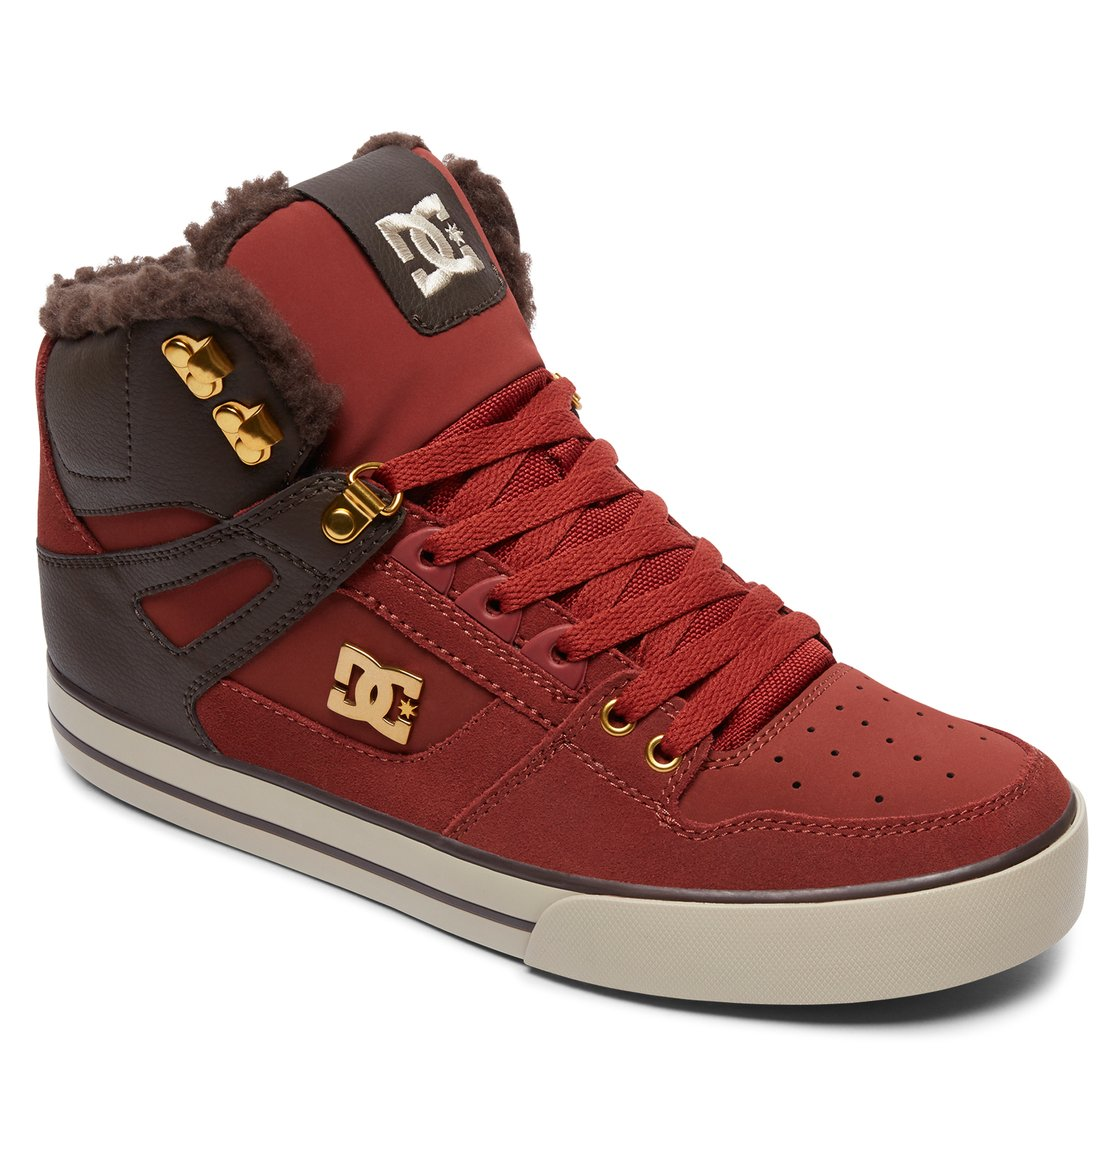 Reebok Spartan Shoes Uk